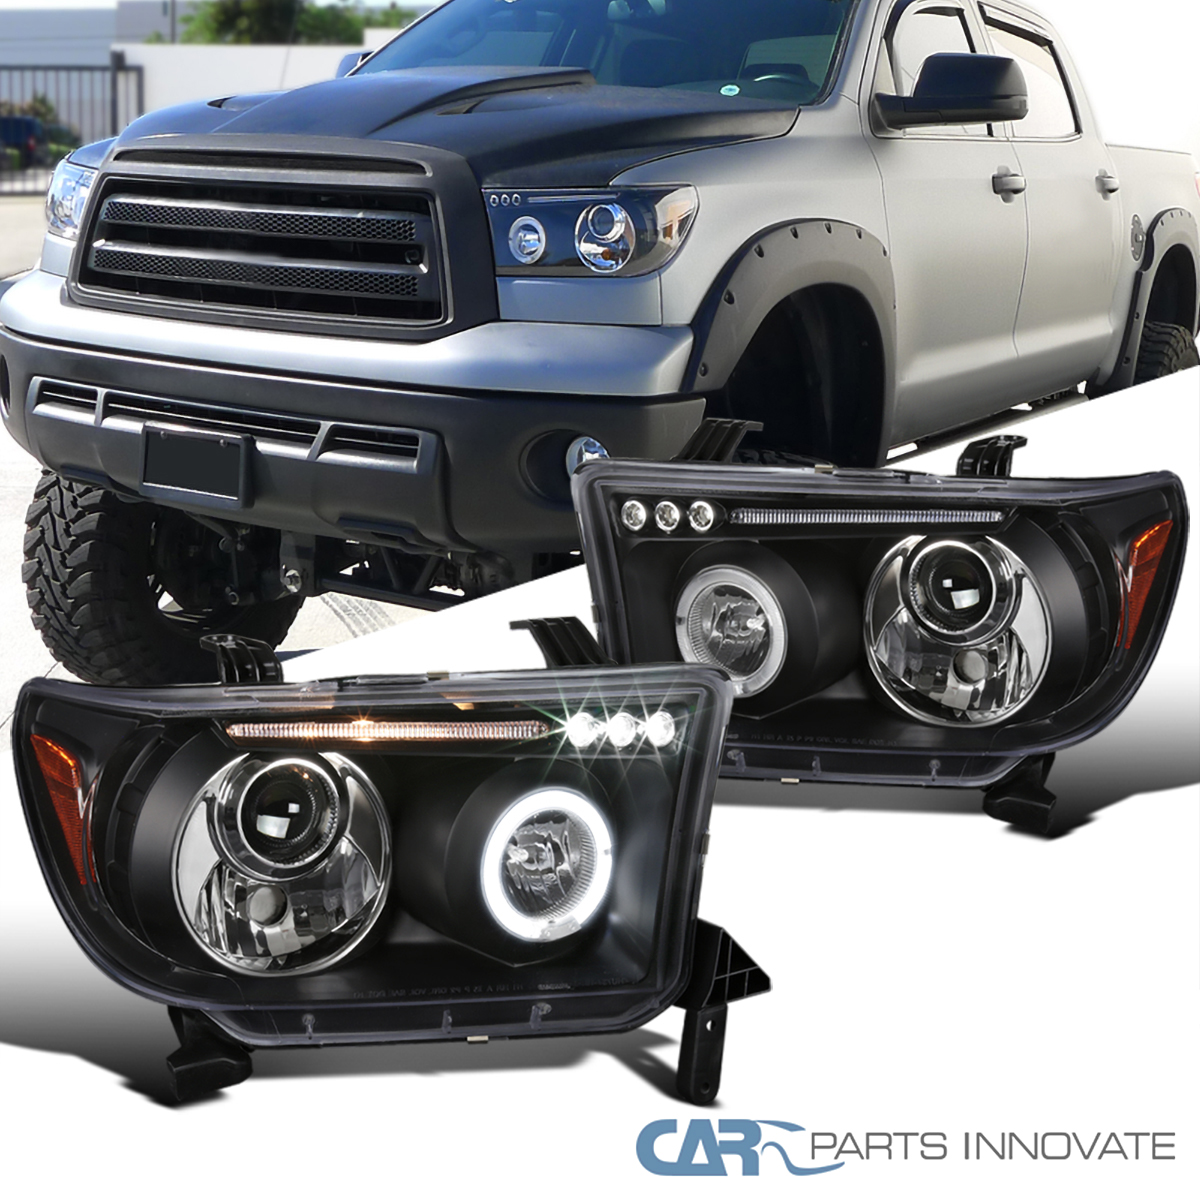 For 2007-2013 Toyota Tundra 08-17 Sequoia LED Halo Projector Headlights Headlamp